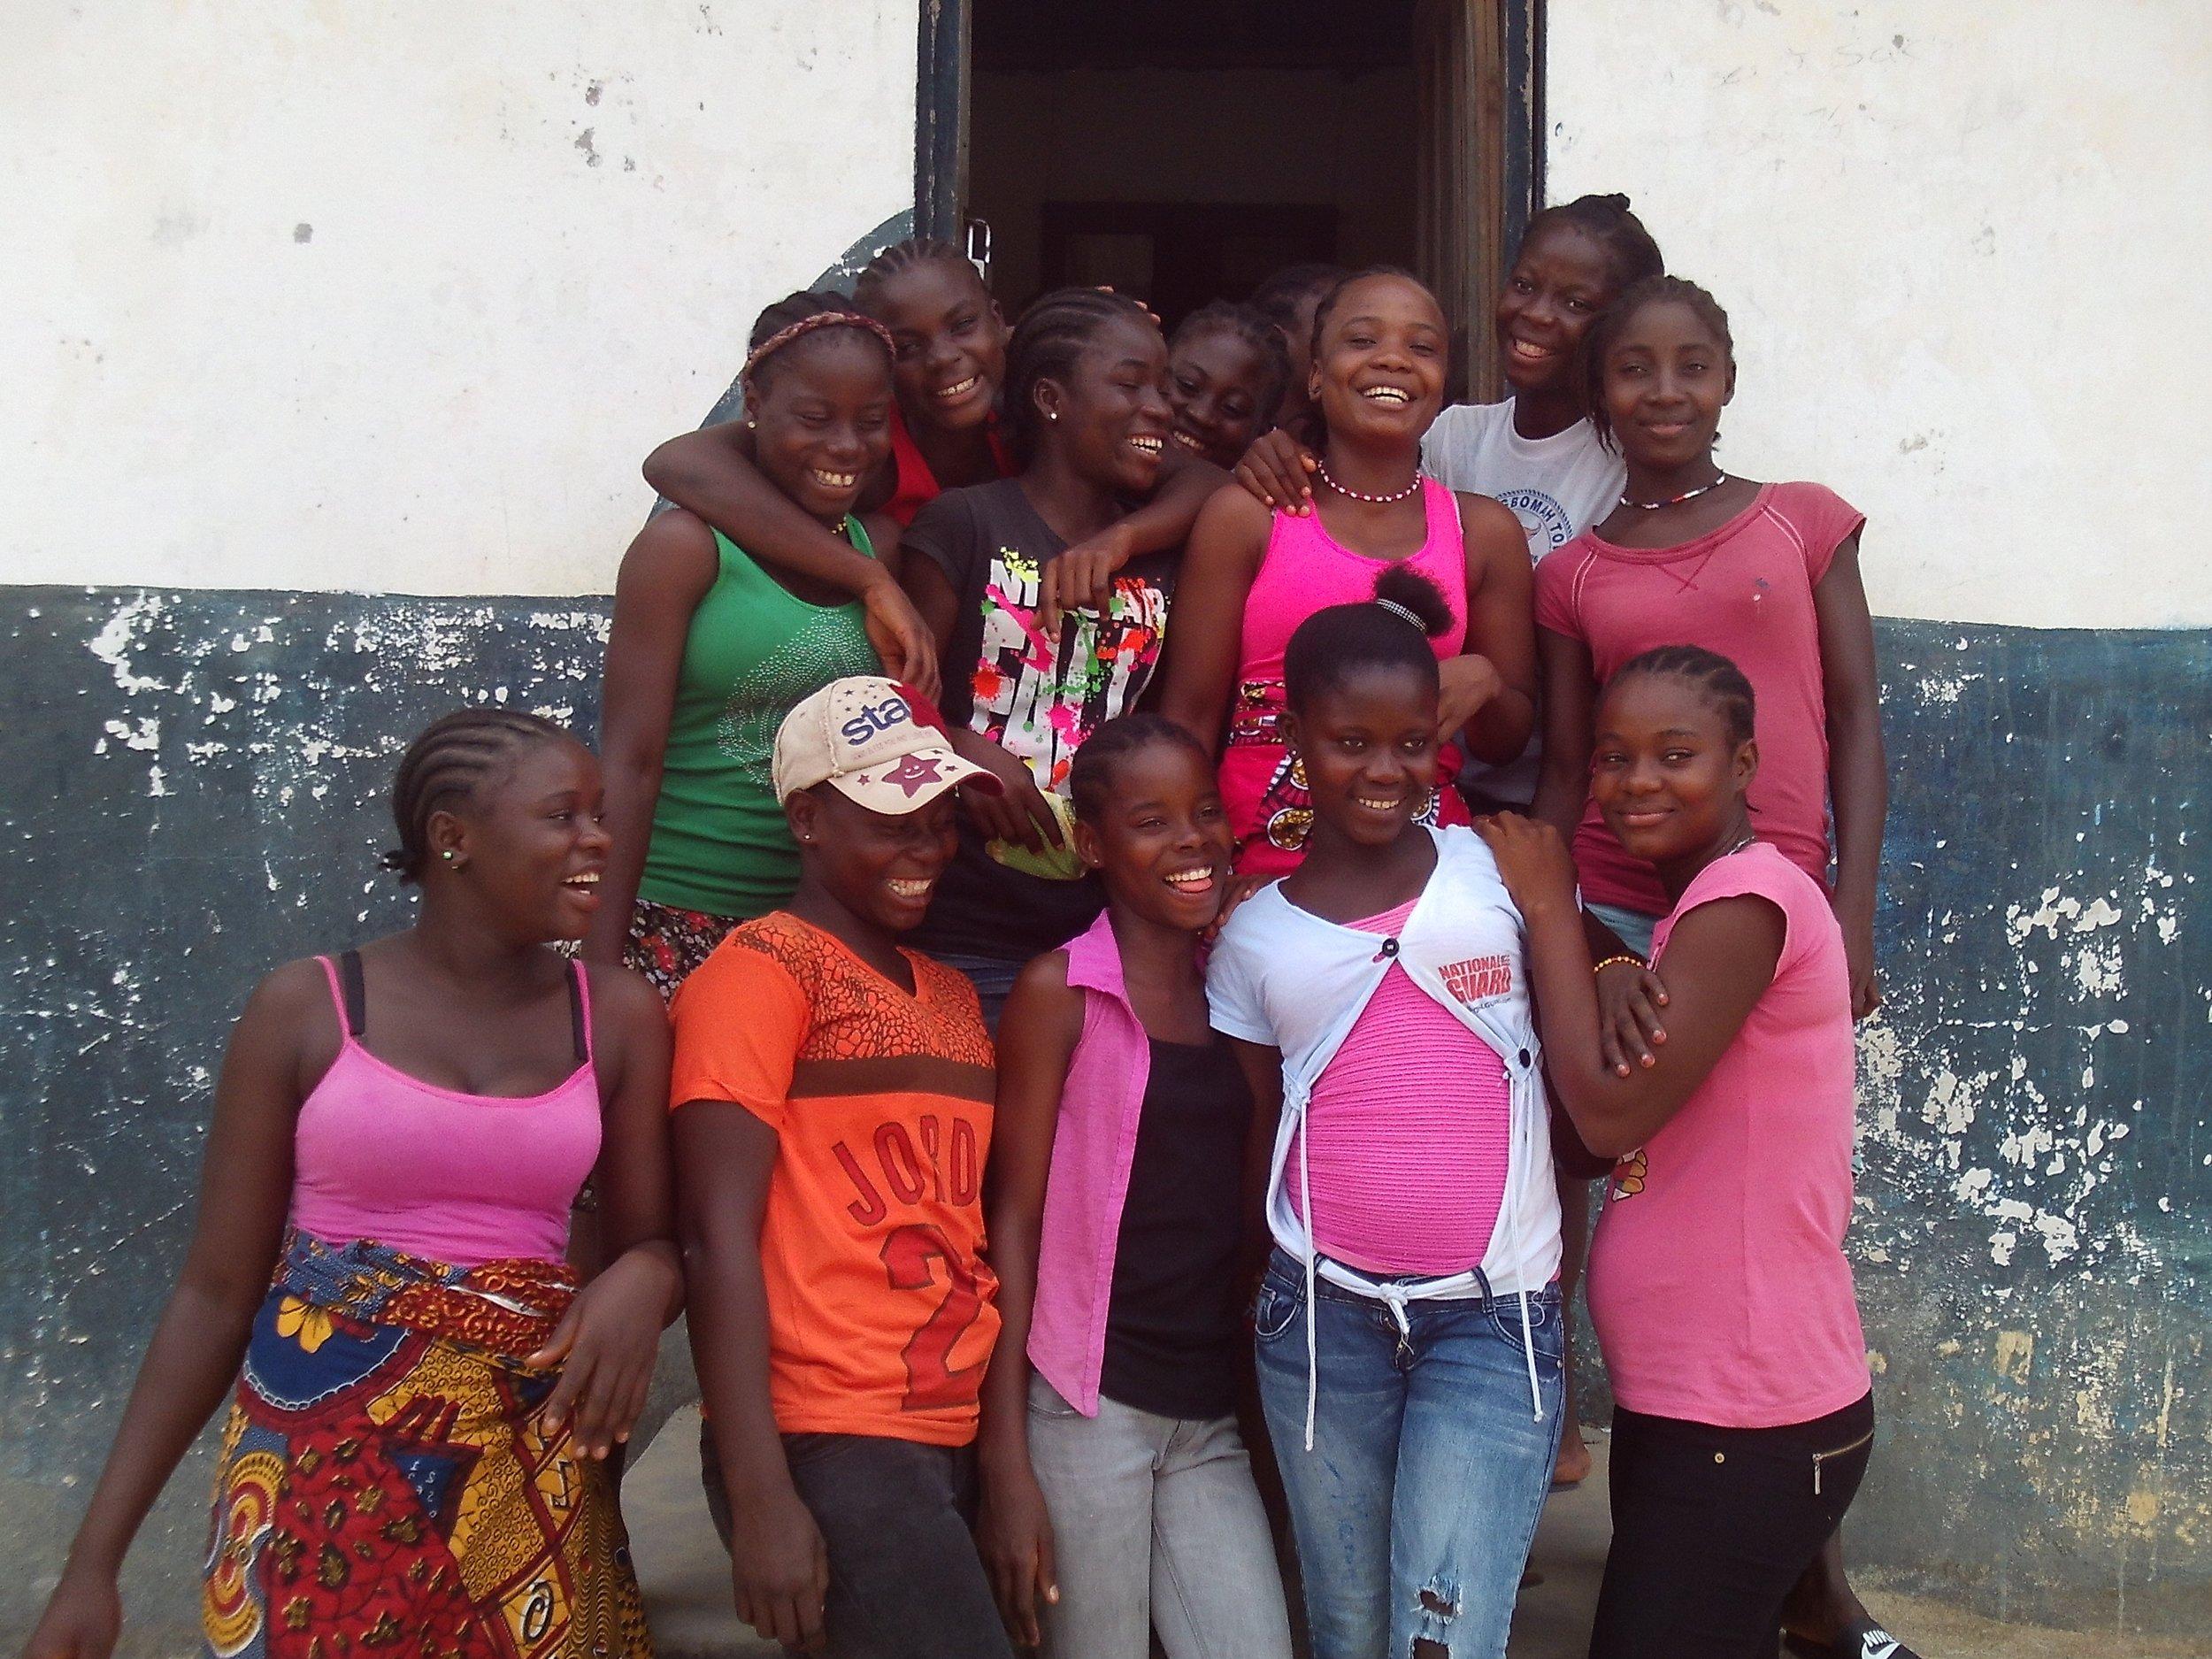 Girls-Education-Liberia-Street-Child